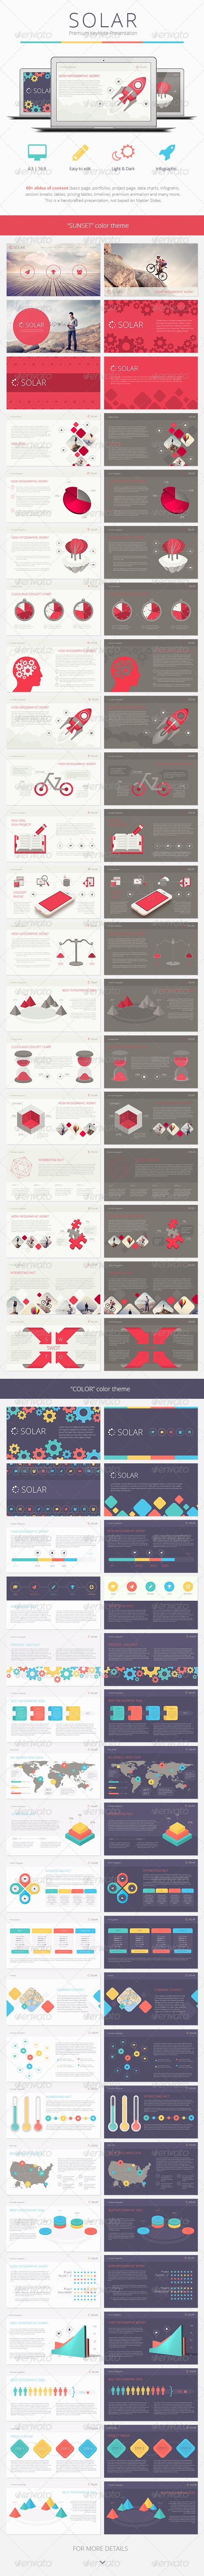 GraphicRiver Solar Keynote Presentation Template 8208898